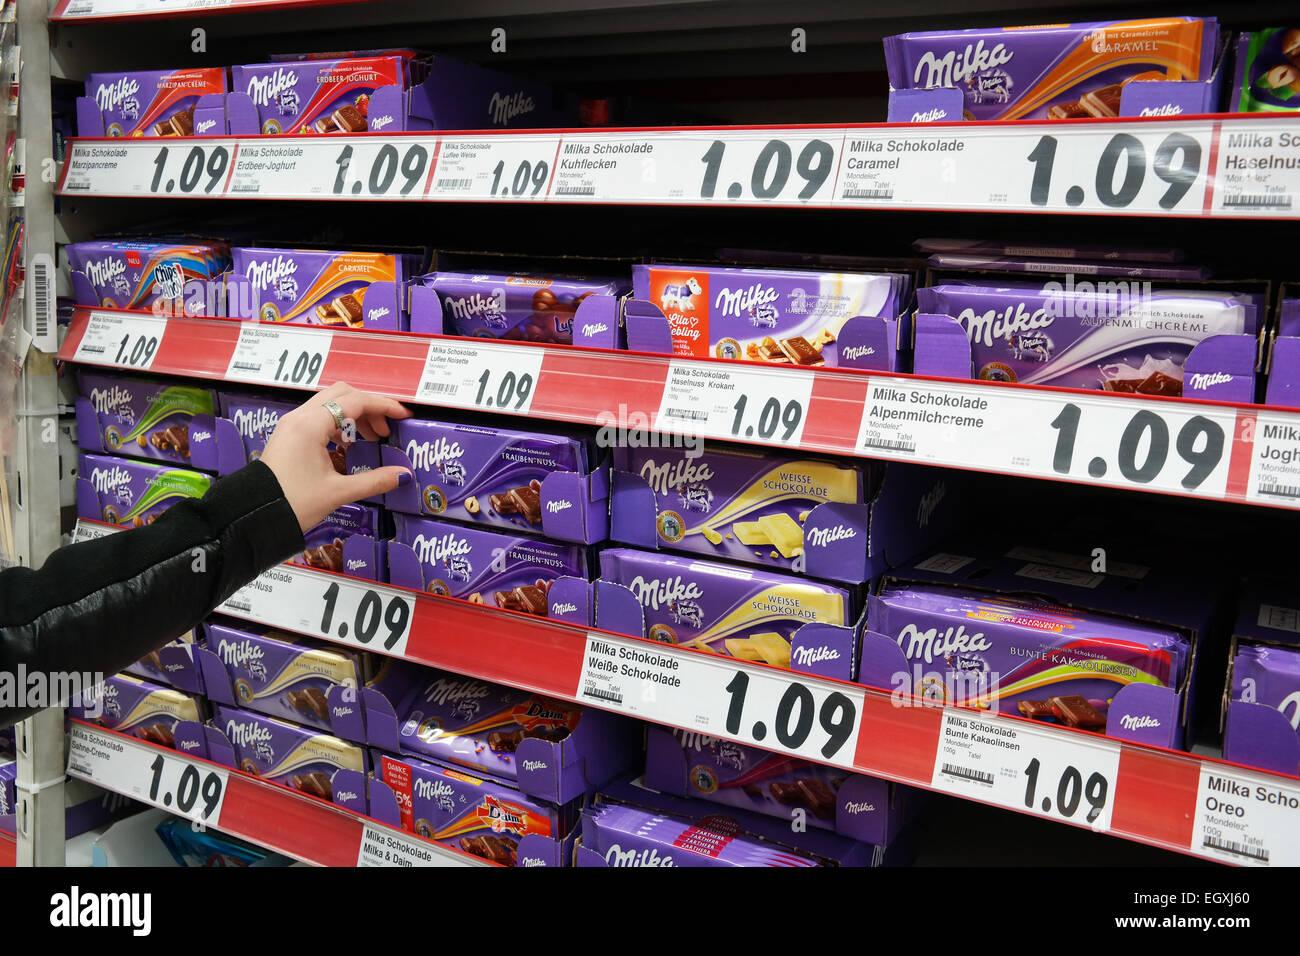 Chocolate Brands In Tesco